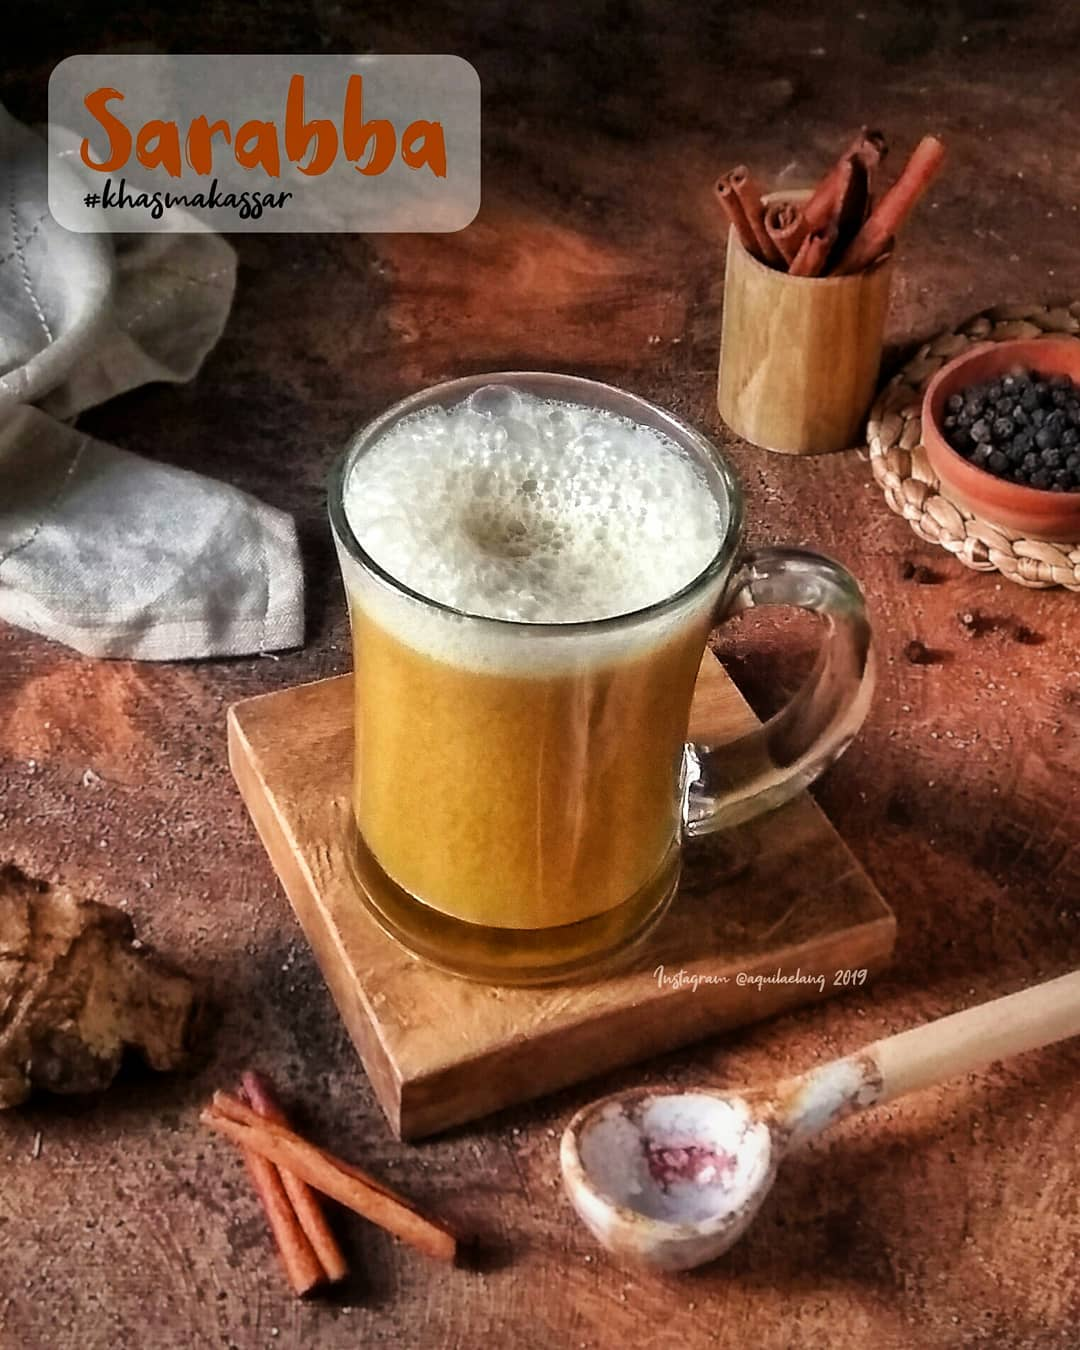 sarabba minuman khas makaasar